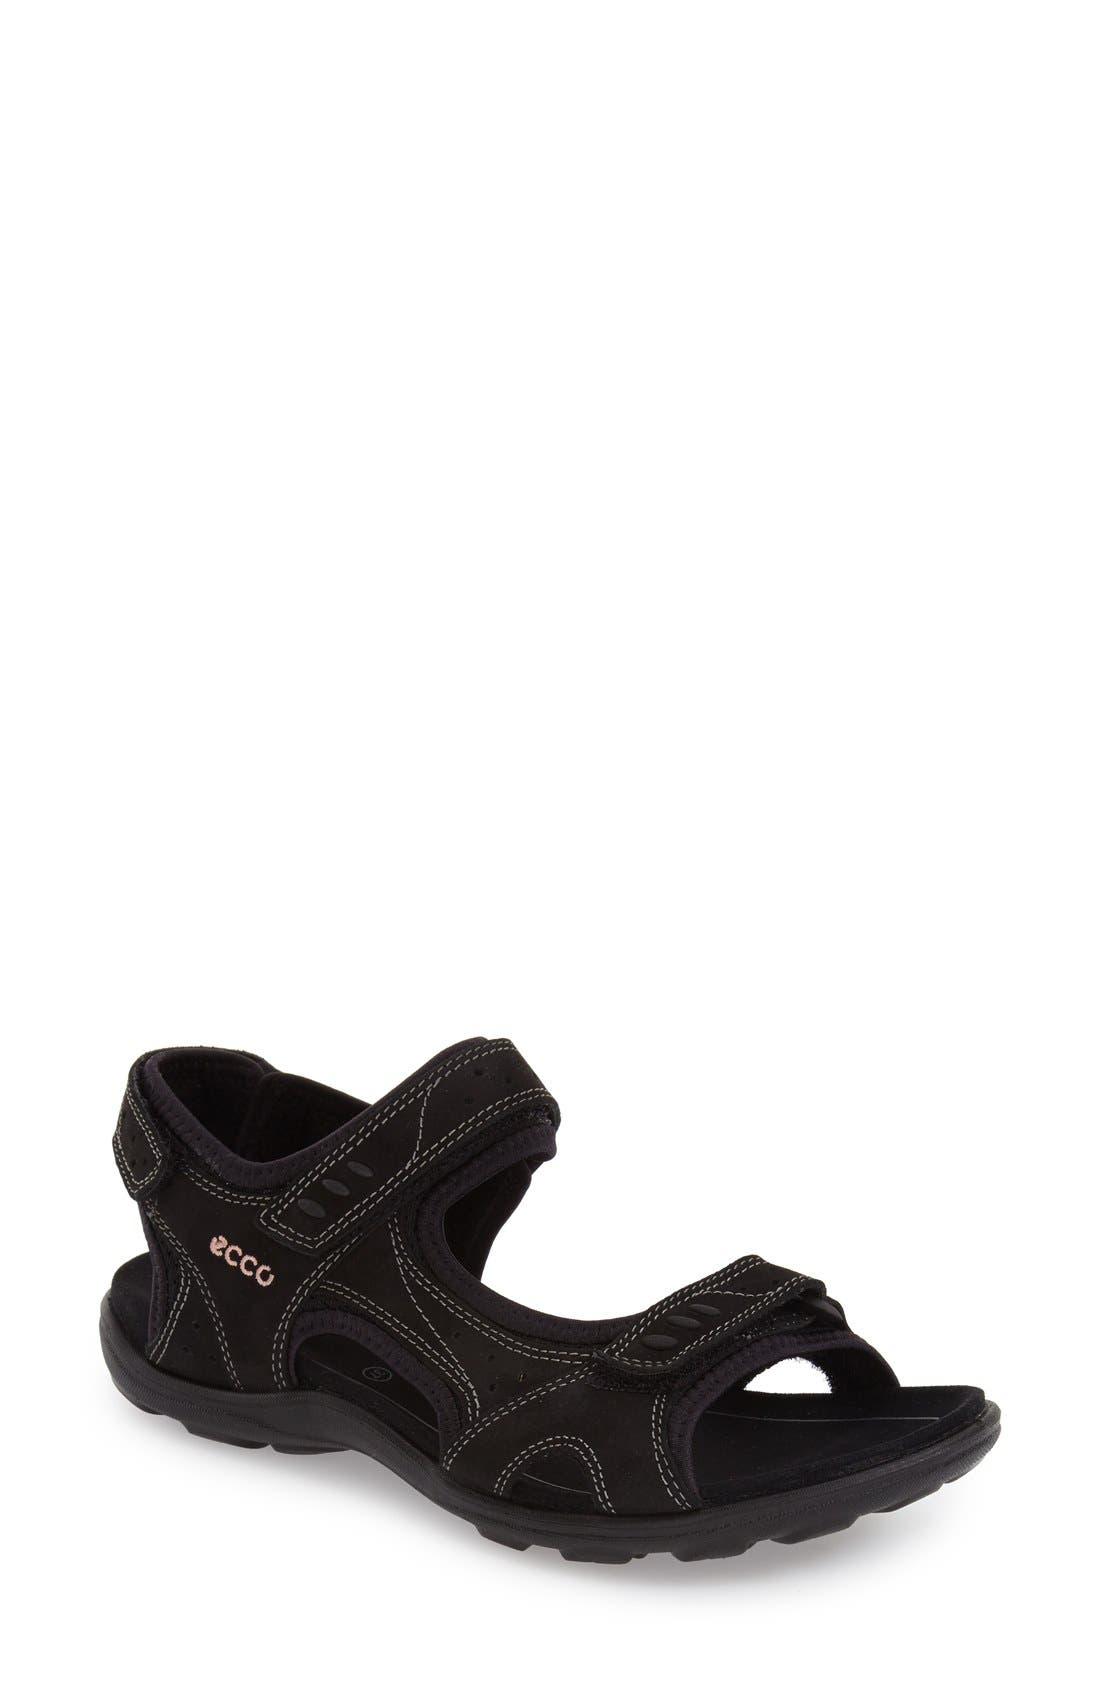 Main Image - ECCO 'Kana' Sport Sandal (Women)